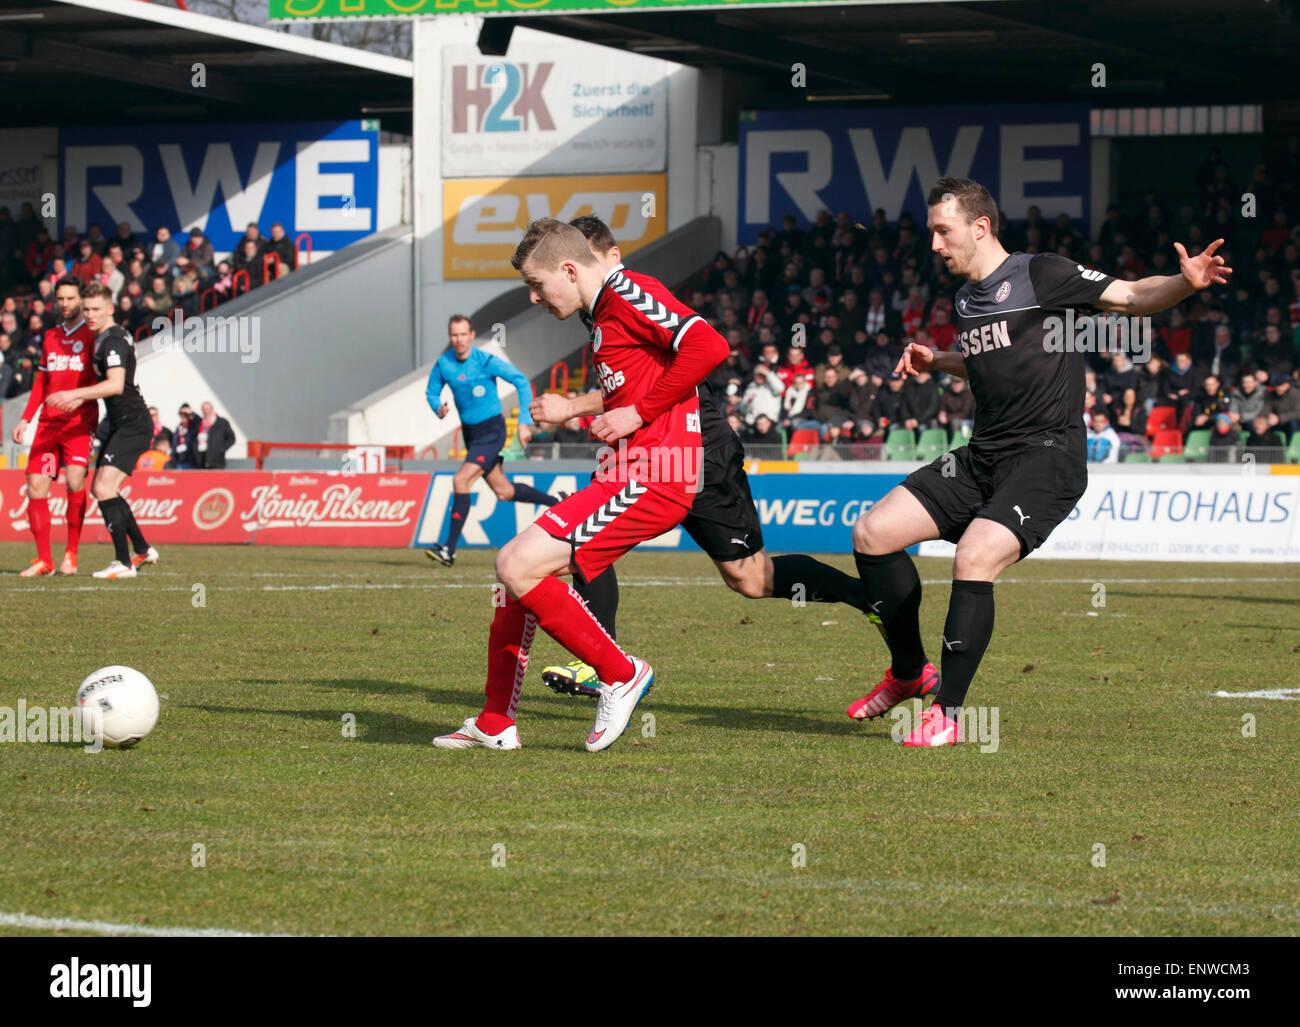 sports, football, Regional League West, 2014/2015, Rot Weiss Oberhausen versus Rot Weiss Essen 1:0, Stadium Niederrhein - Stock Image